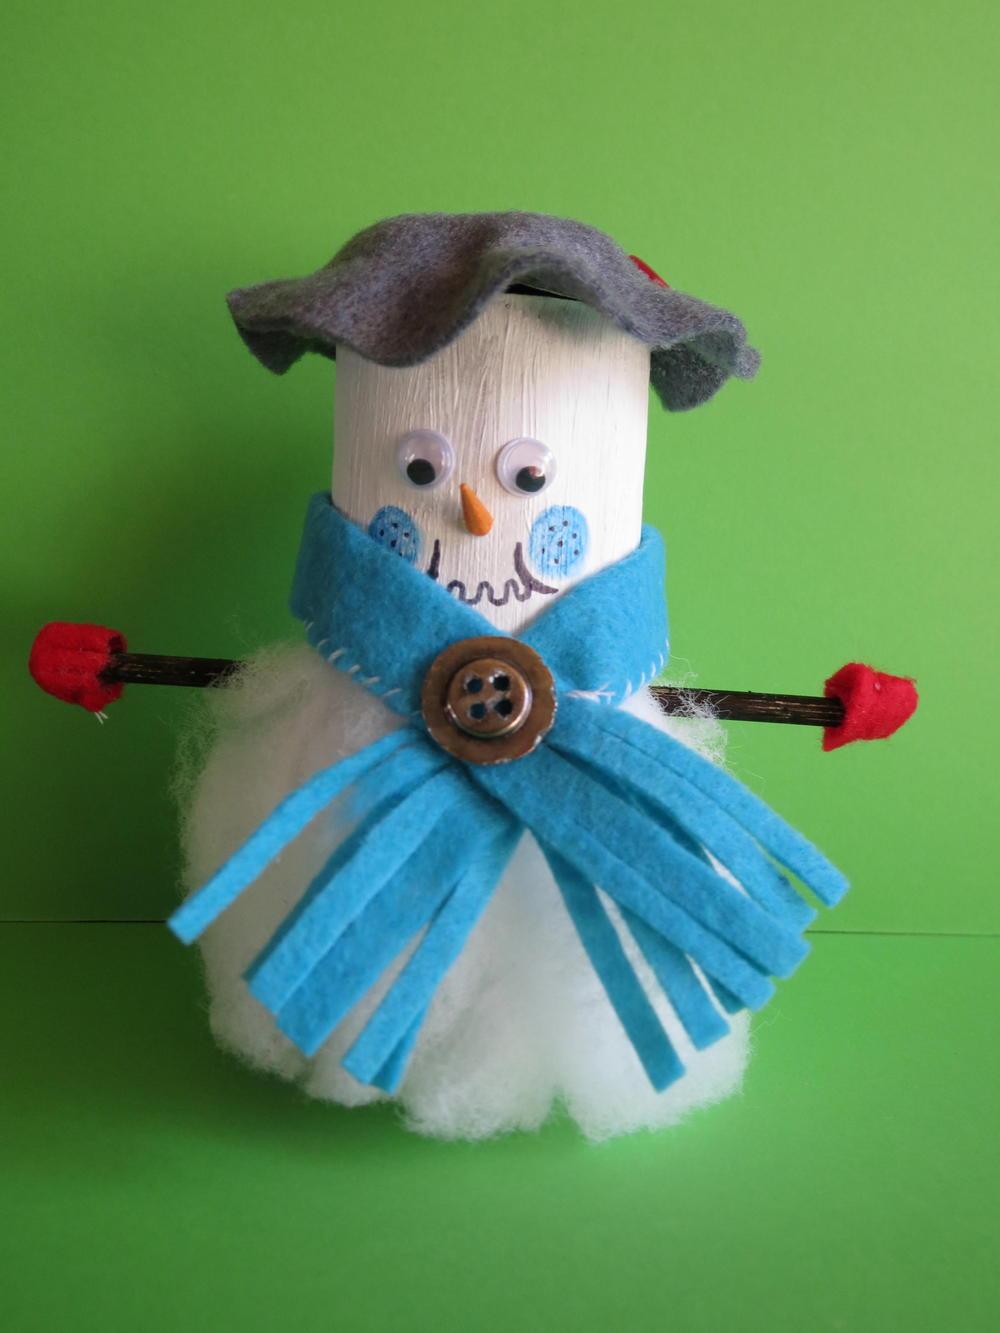 Christmas Snowman Toilet Paper Roll Craft Favecrafts Com